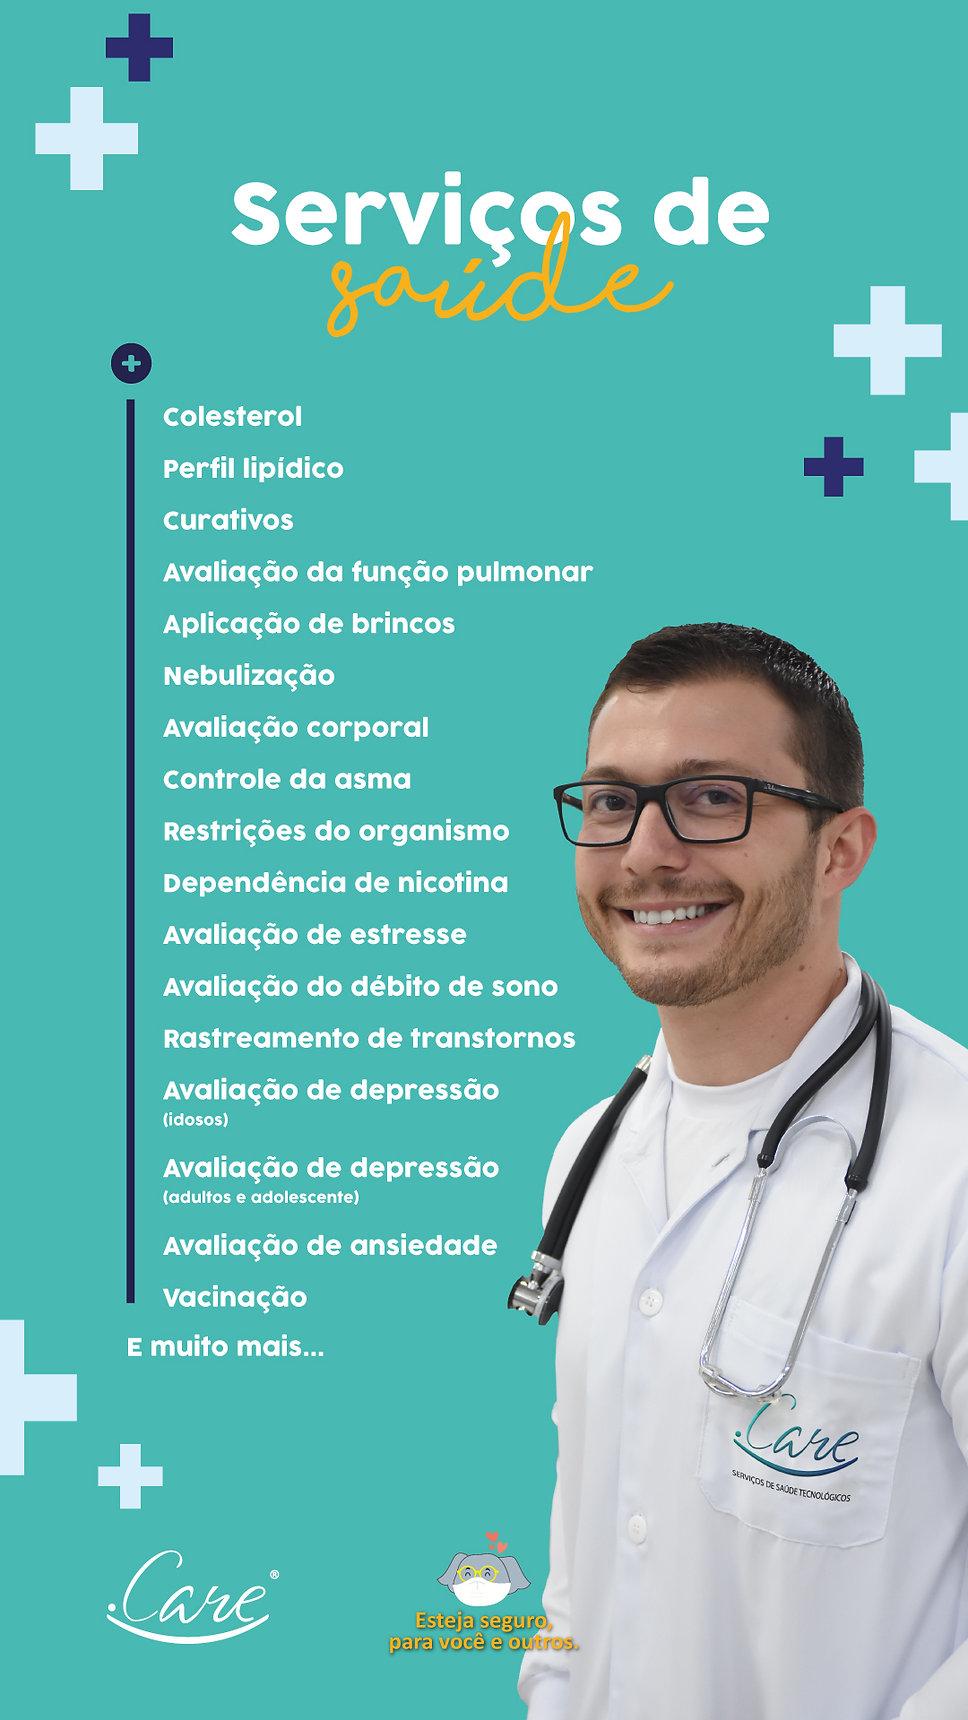 Servicos-disponiveis-01.jpg